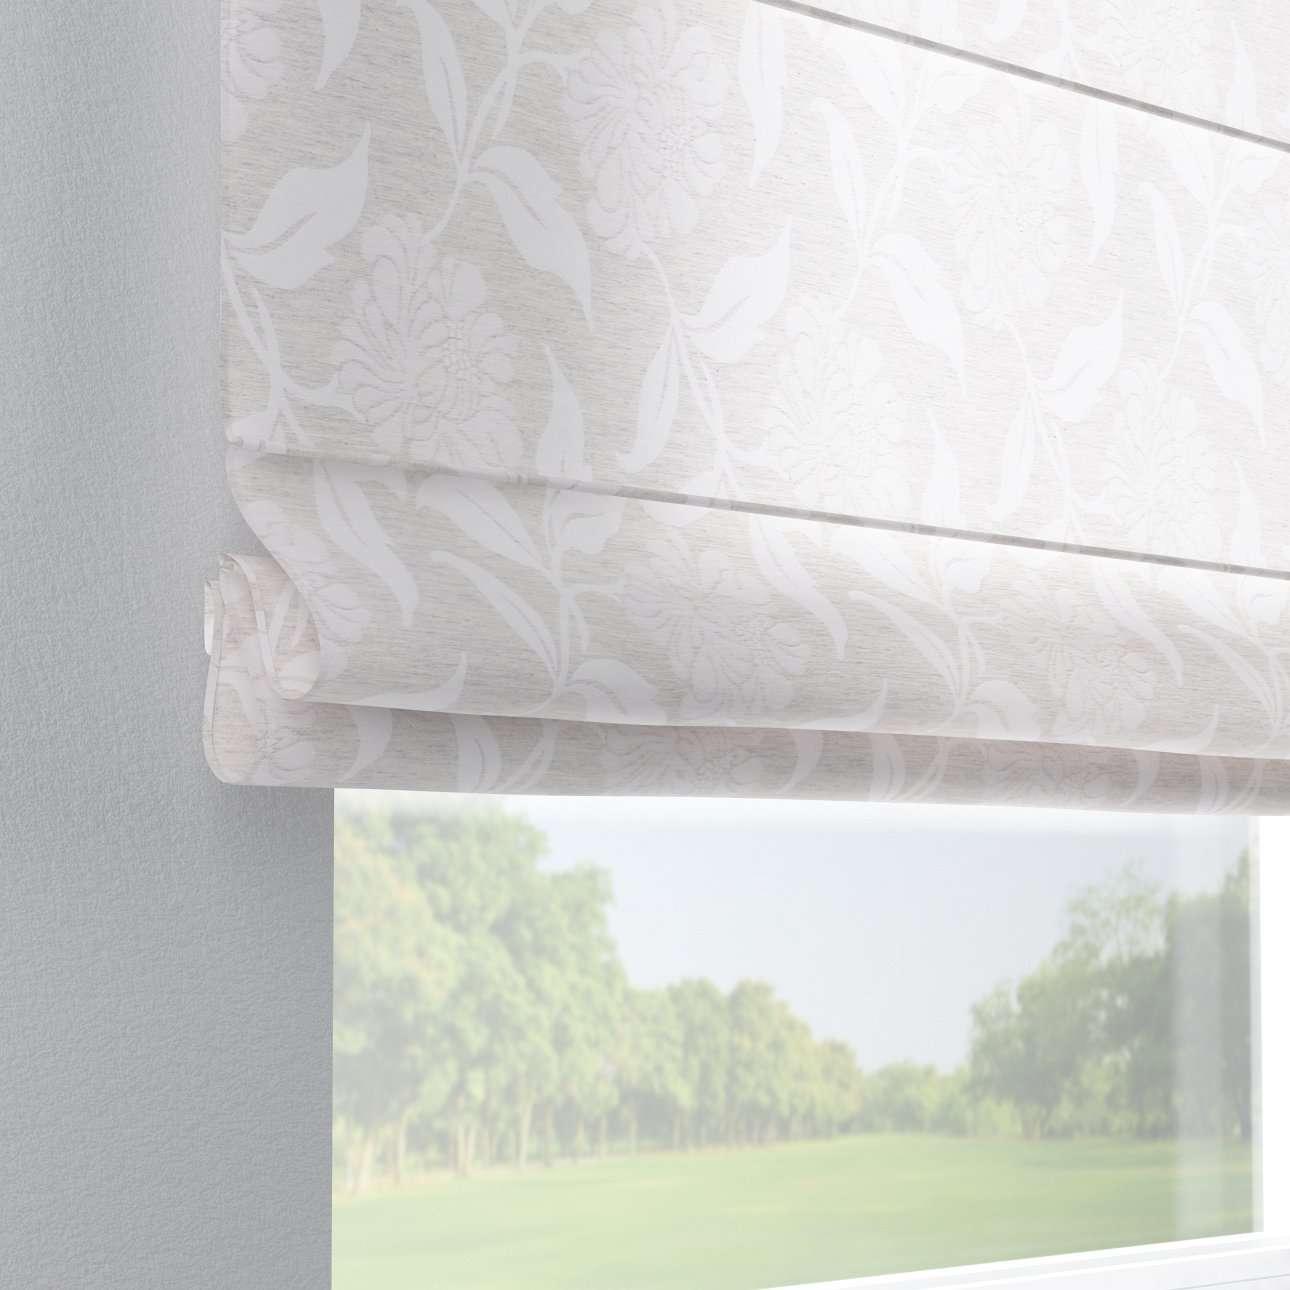 Capri roman blind 80 x 170 cm (31.5 x 67 inch) in collection Venice, fabric: 140-51